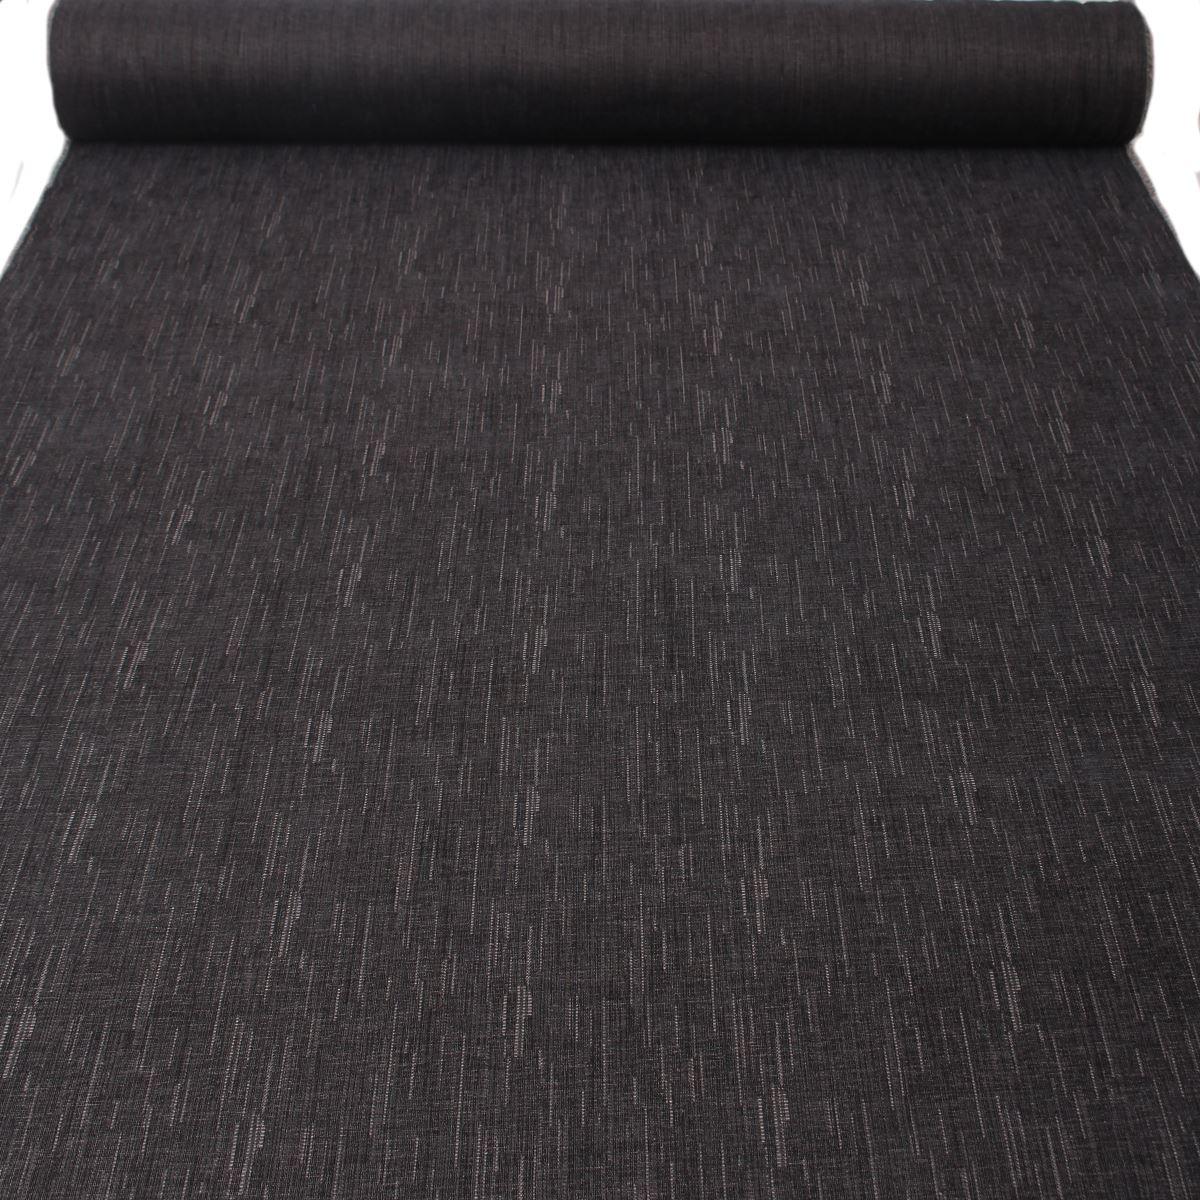 034-Chenille-034-Slubbed-Shabby-Worn-Look-Curtain-Cushion-Sofa-Upholstery-Fabric thumbnail 9